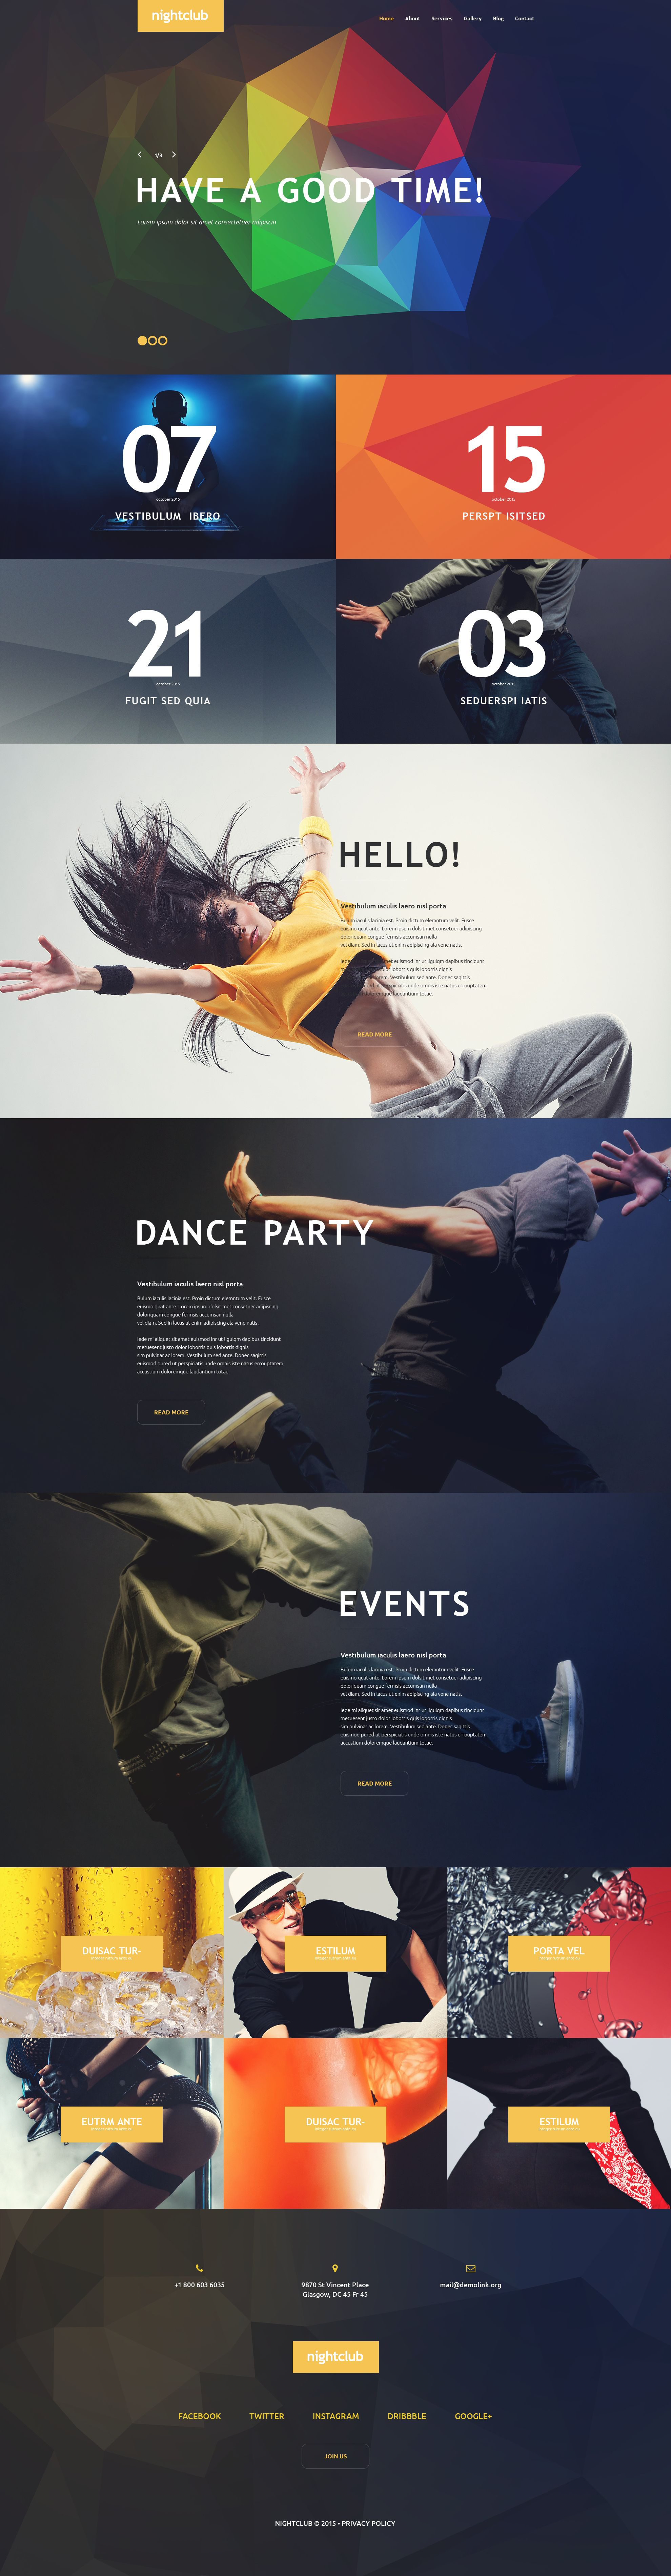 Night Club WordPress Theme - screenshot